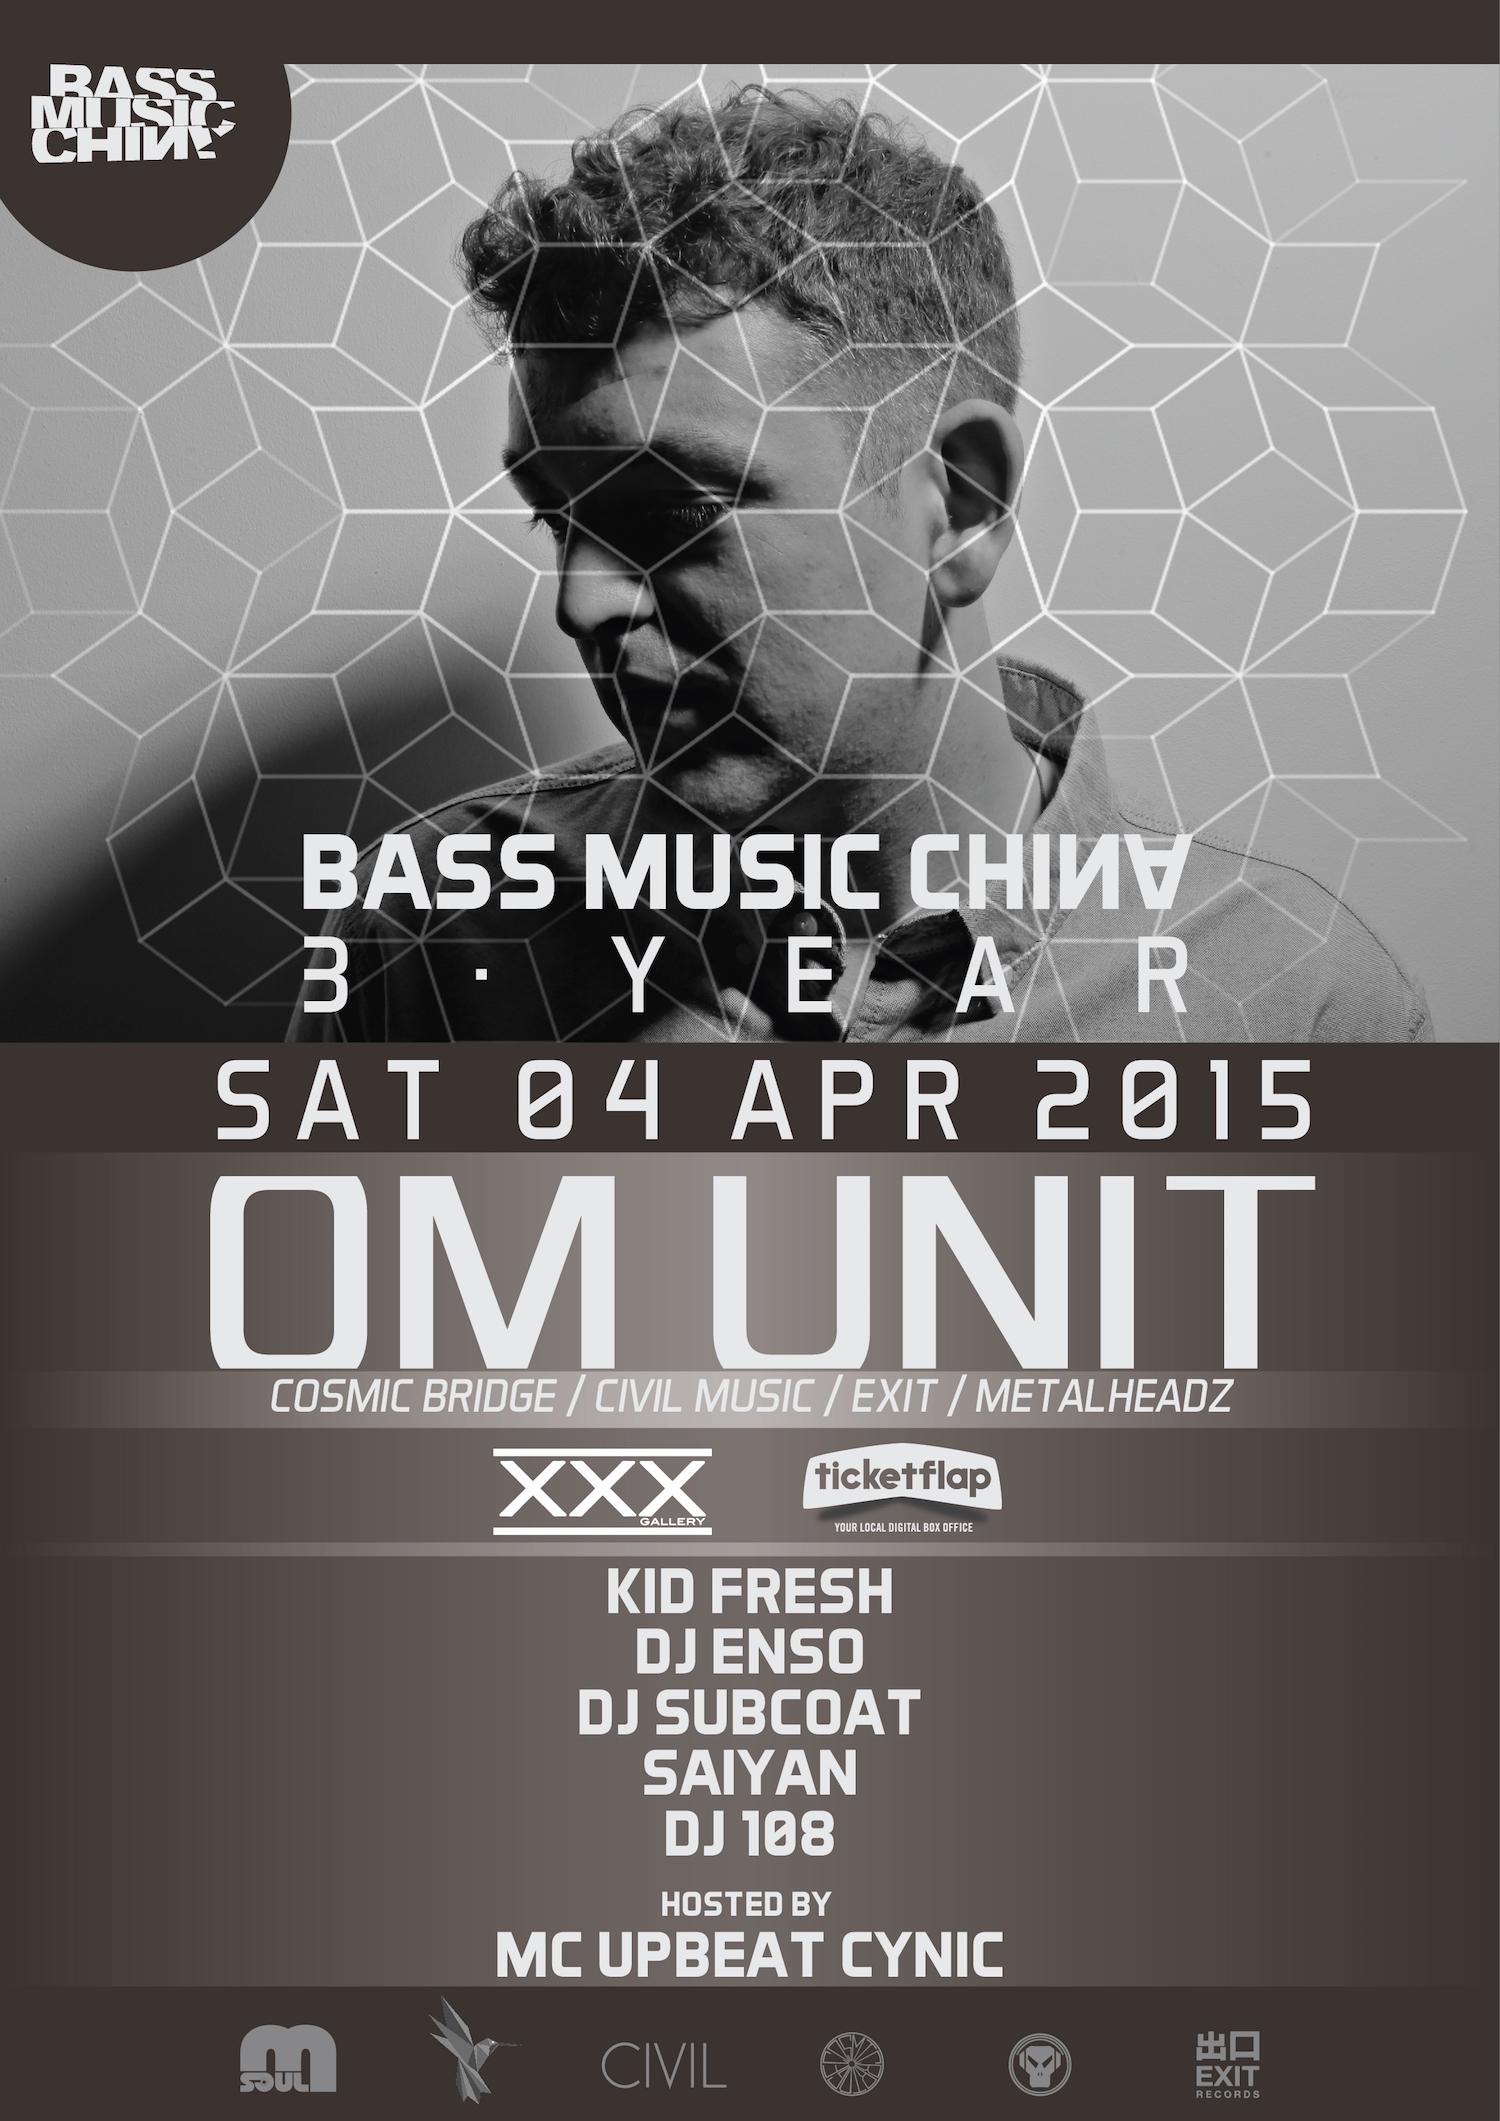 Bass Music China 3 Year Tickets, Apr 04, 2015   Ticketflap